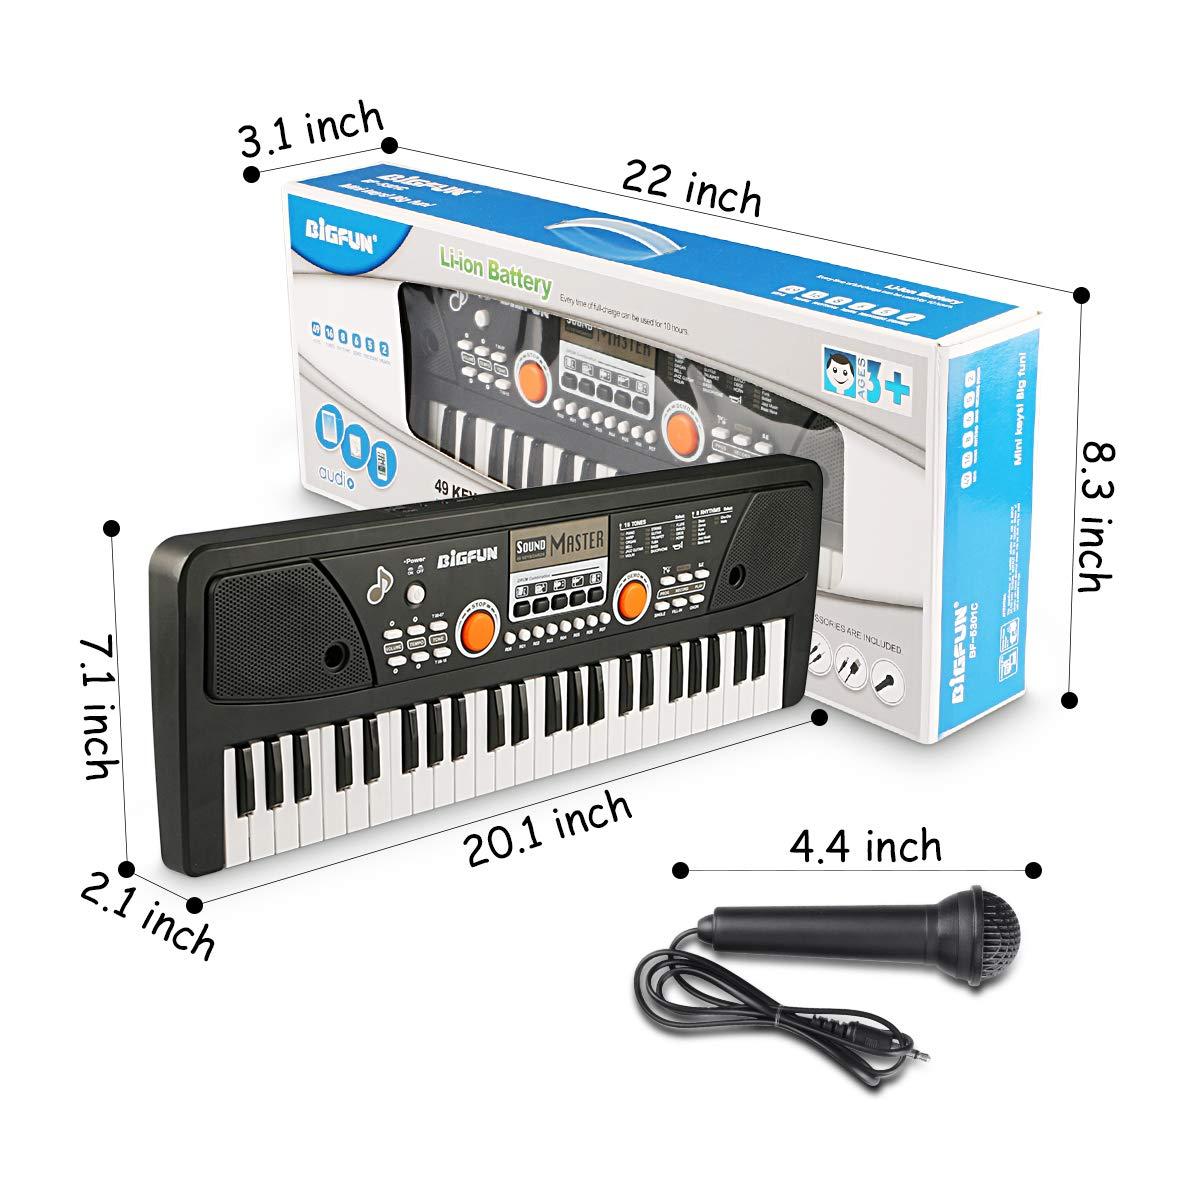 RenFox 49 Key Piano Keyboard Portable Electronic Kids Piano Keyboard Beginner Digital Music Piano Keyboard & Microphone Teaching Toy Gift for Kids Boy Girl by RenFox (Image #6)